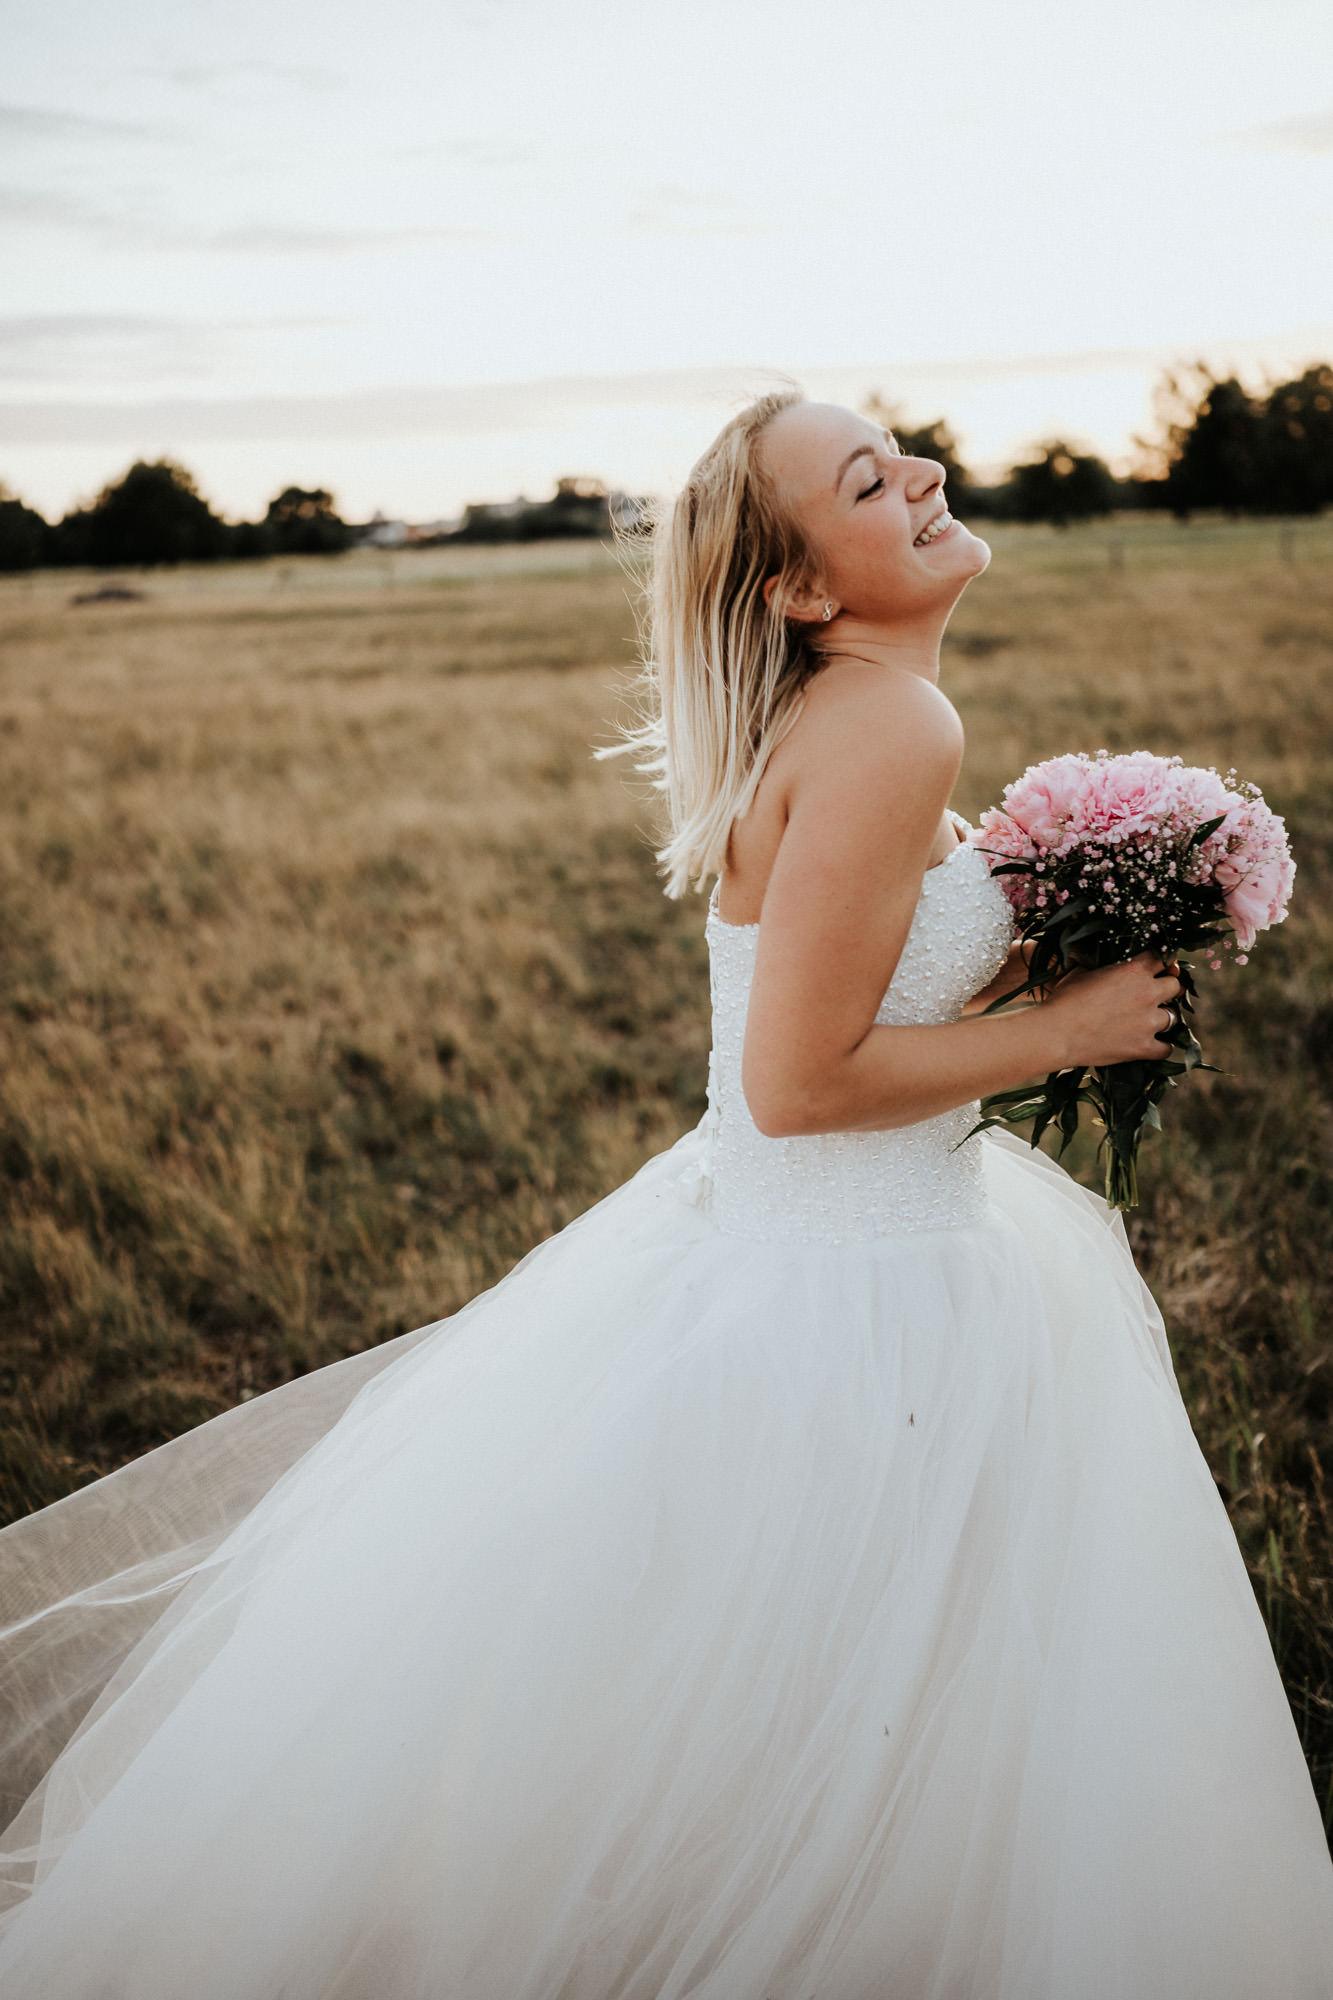 waltsmedia-hochzeitsreportage-after-wedding-shooting-berlin-23